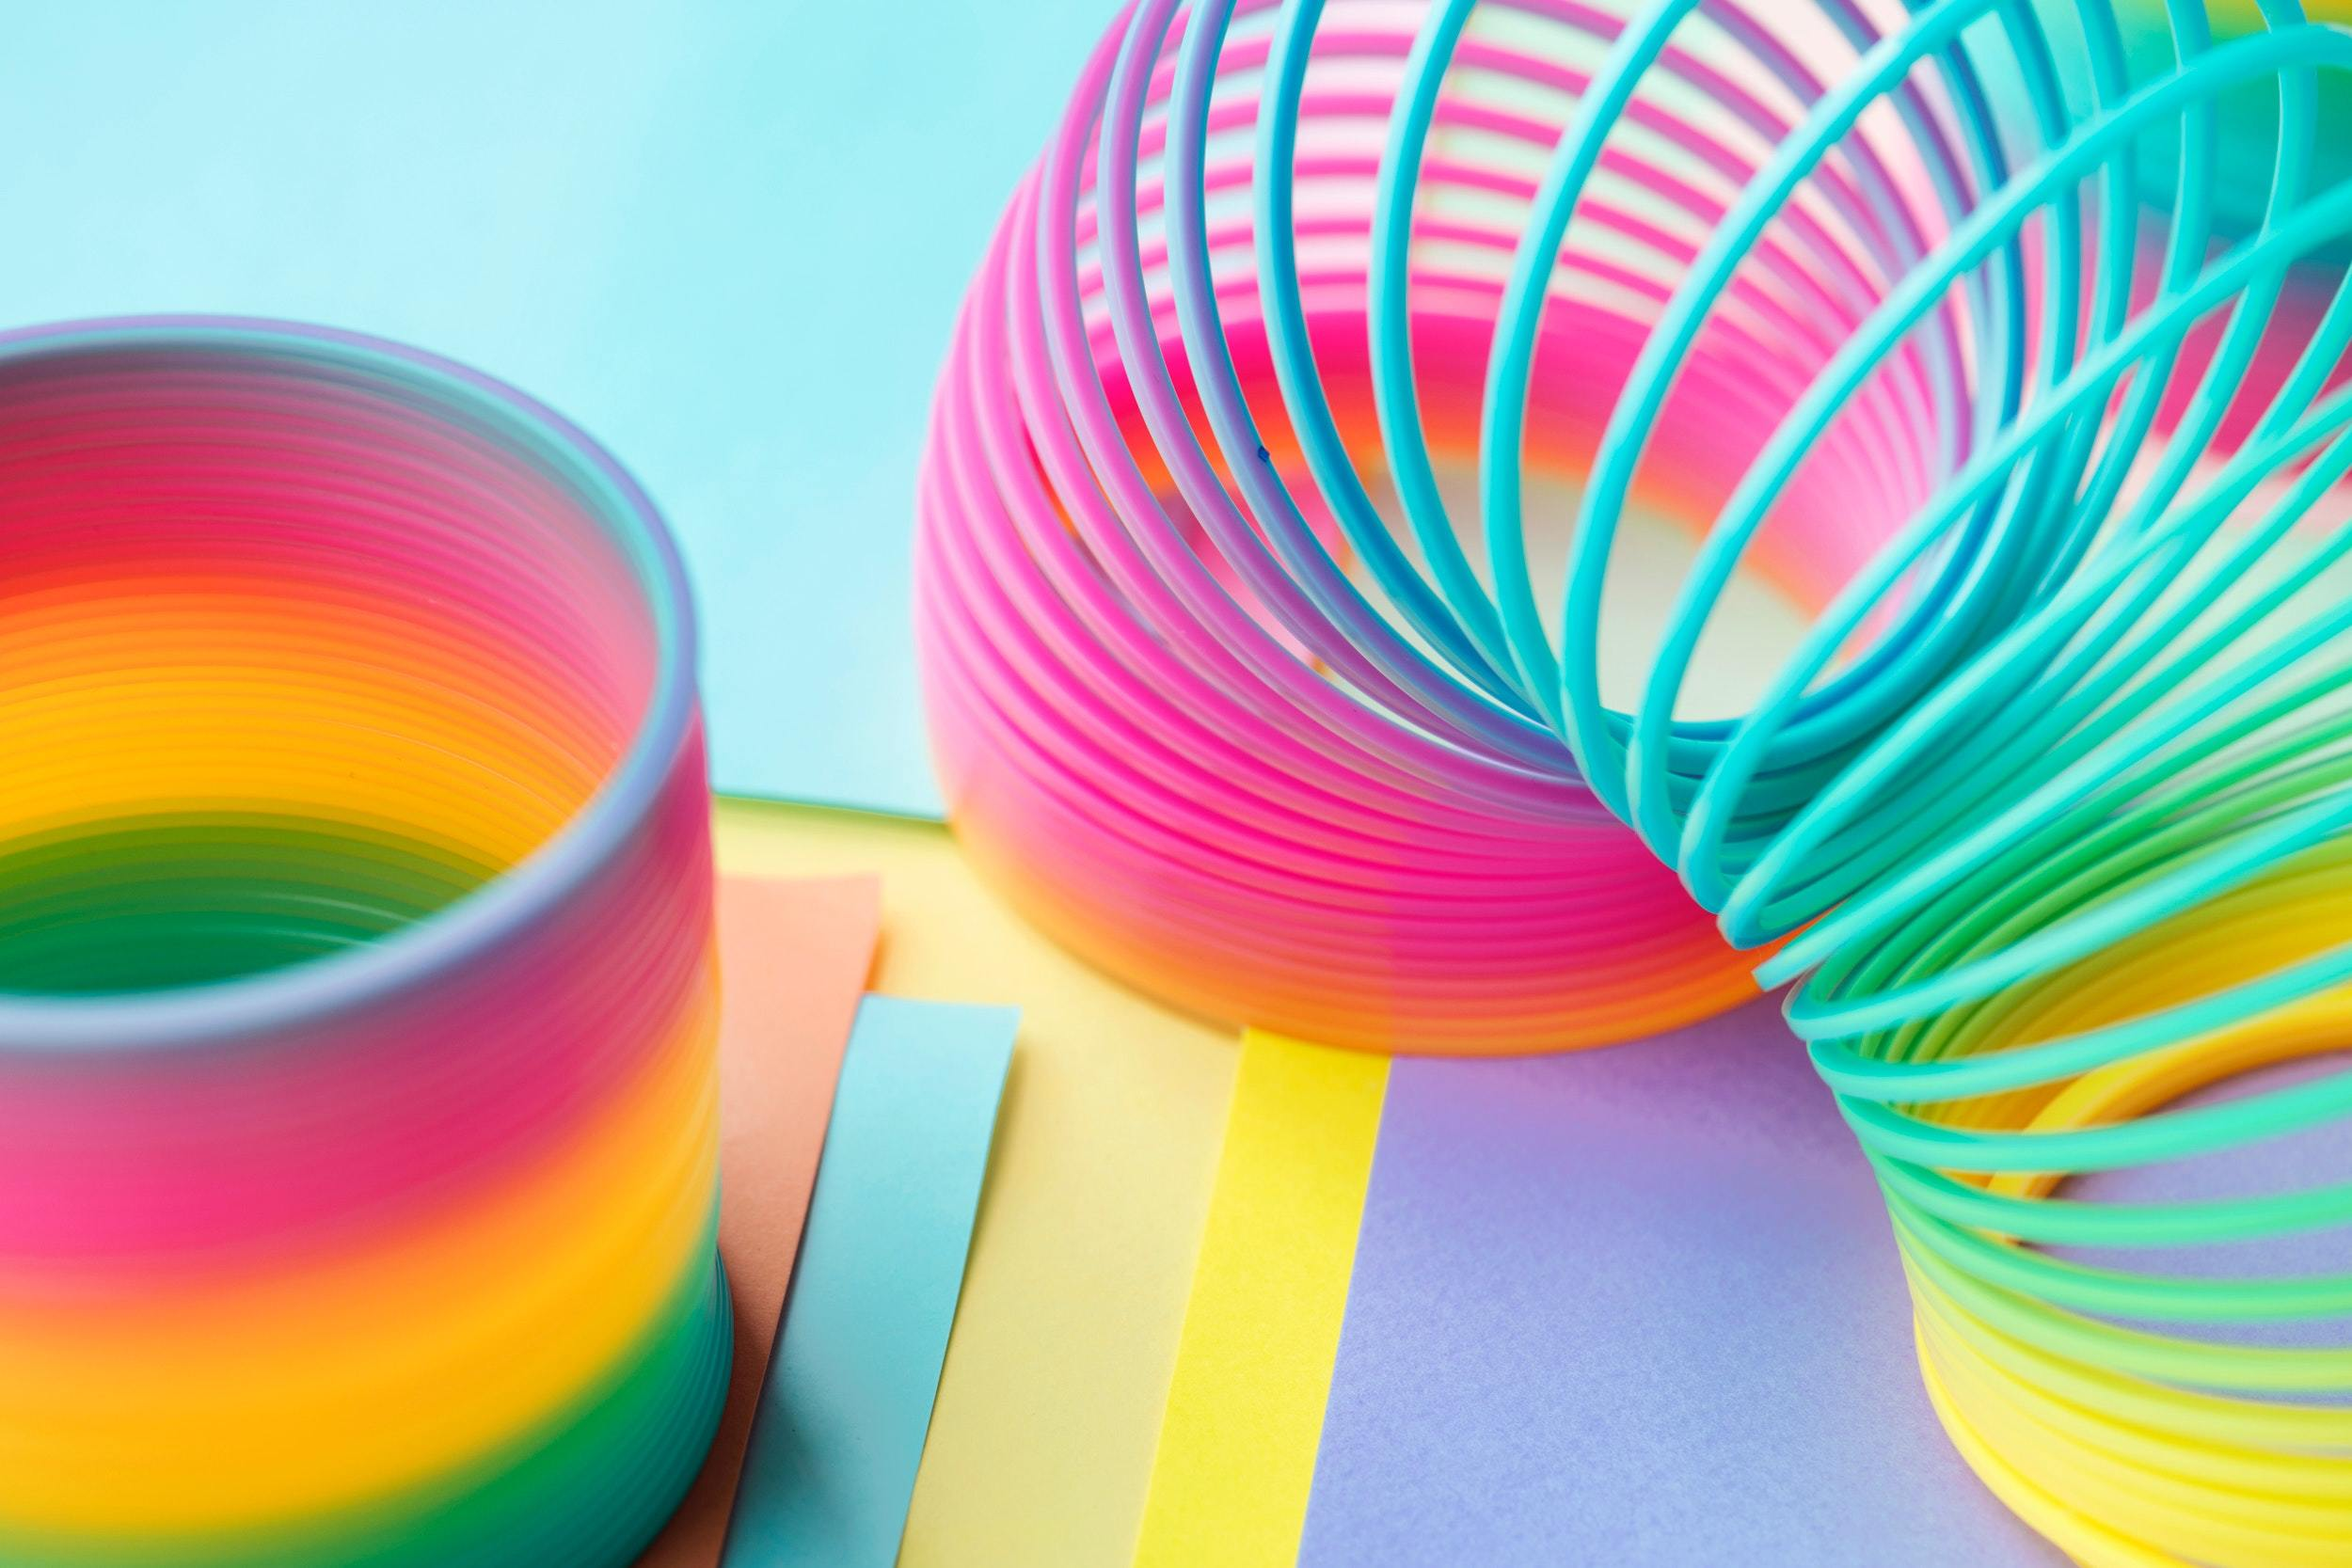 Картинка: Радуга, цвет, красочная, забава, игра